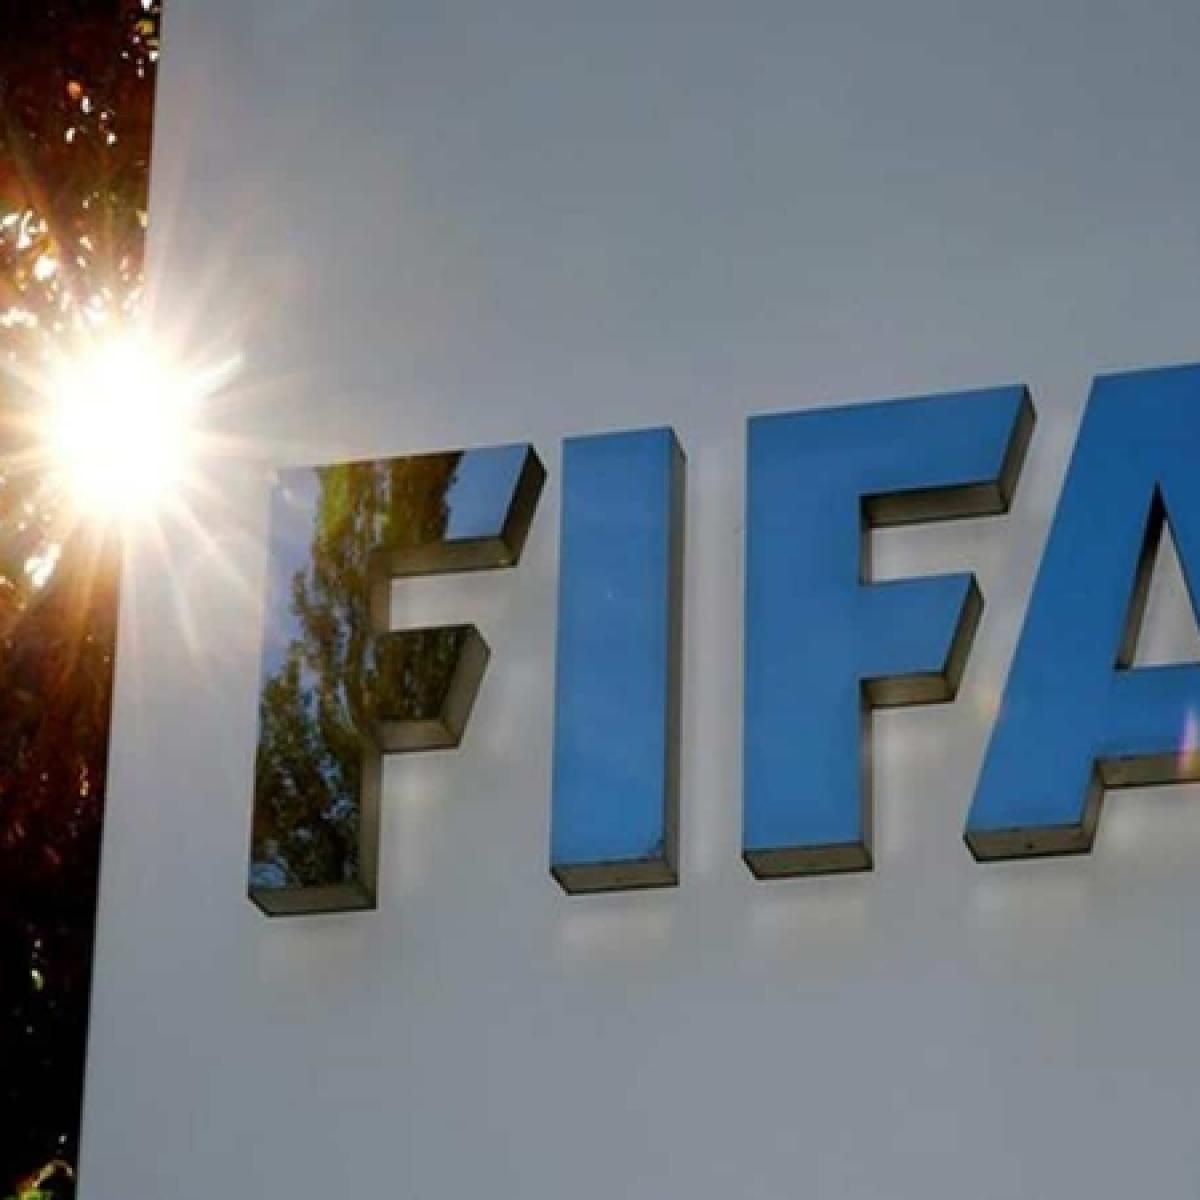 FIFA postpones U-17 Women's World Cup in India due to coronavirus outbreak